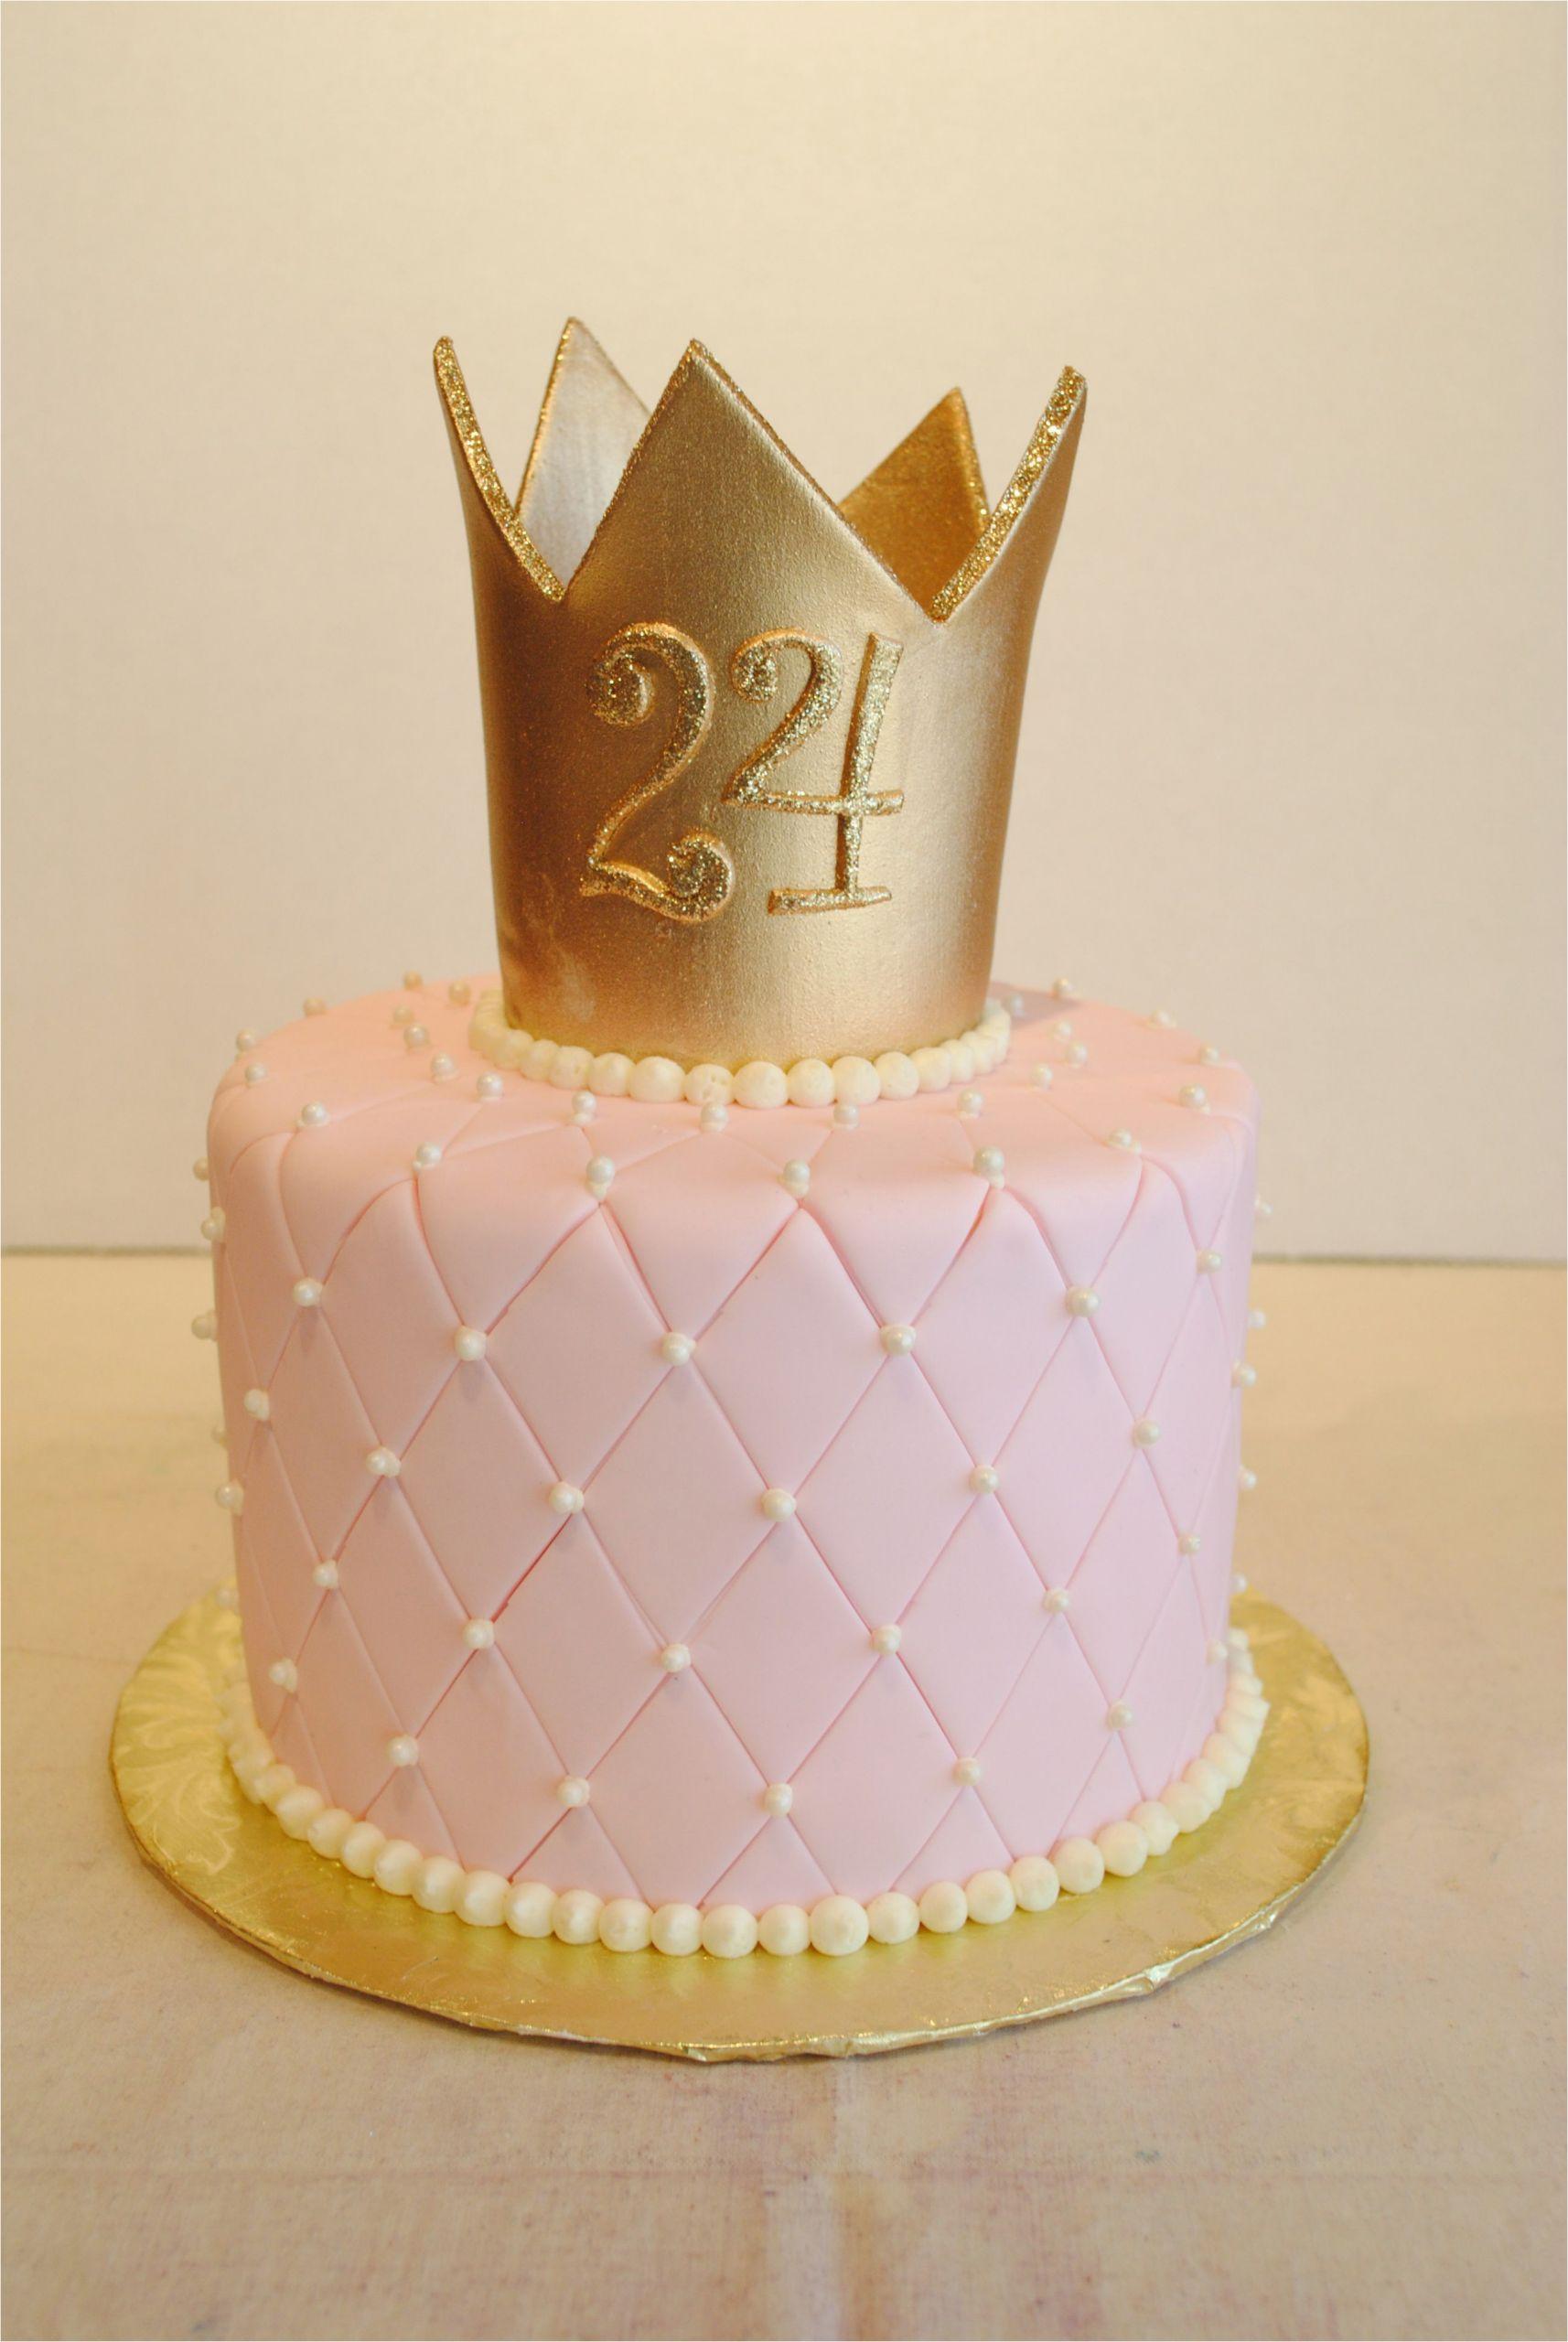 24th Birthday Cake Ideas for Him Best 25 24th Birthday Cake Ideas On Pinterest 24